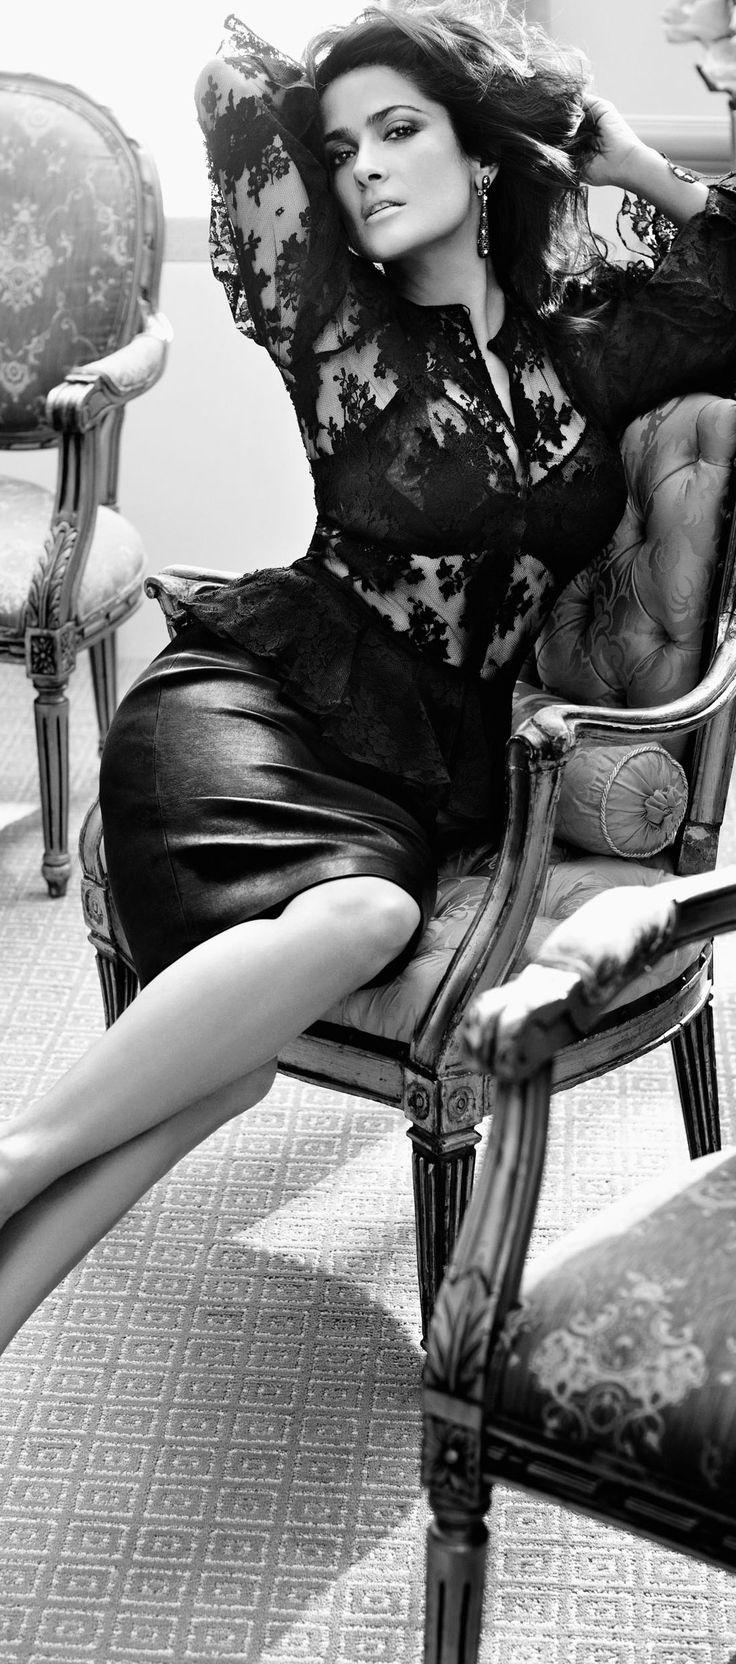 Salma Hayek - September 2012 - After Hours - Vogue Germany - Alexander McQueen Lace blouse and pumps, Bally Pencil skirt, La Perla bra, De Grisogono 'Goccie' Diamond Earrings - Photo by Alexi Lubomirski